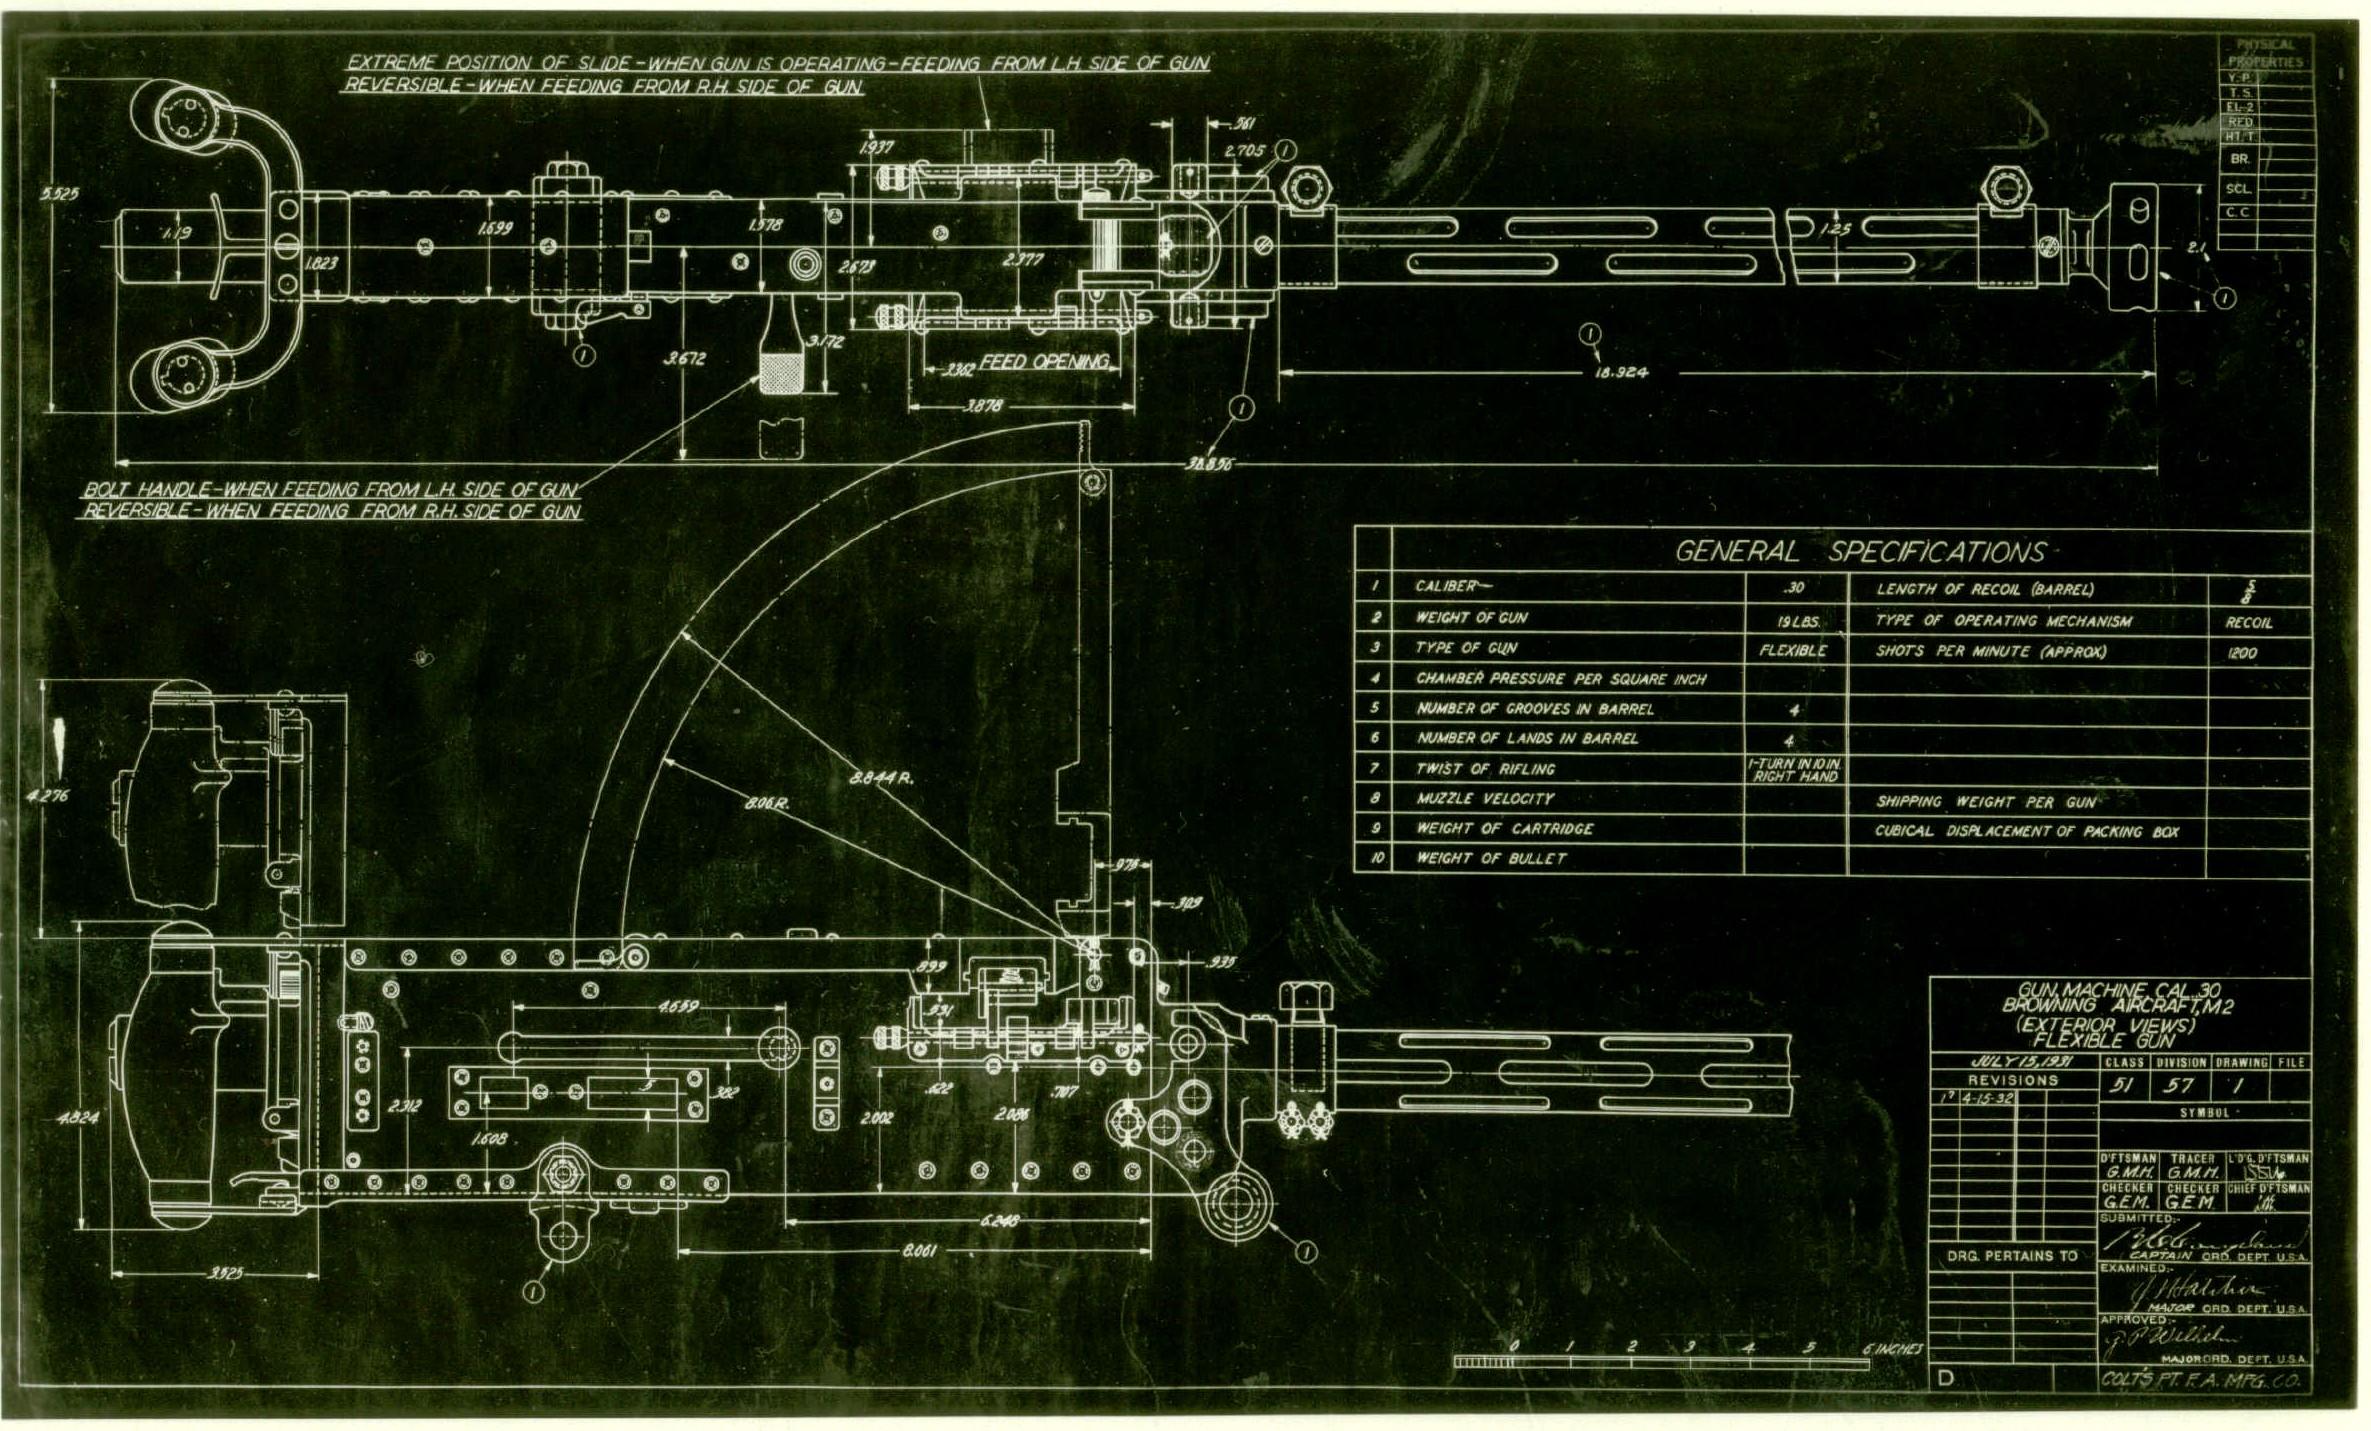 Gun Engineering Drawings And Engineering Division